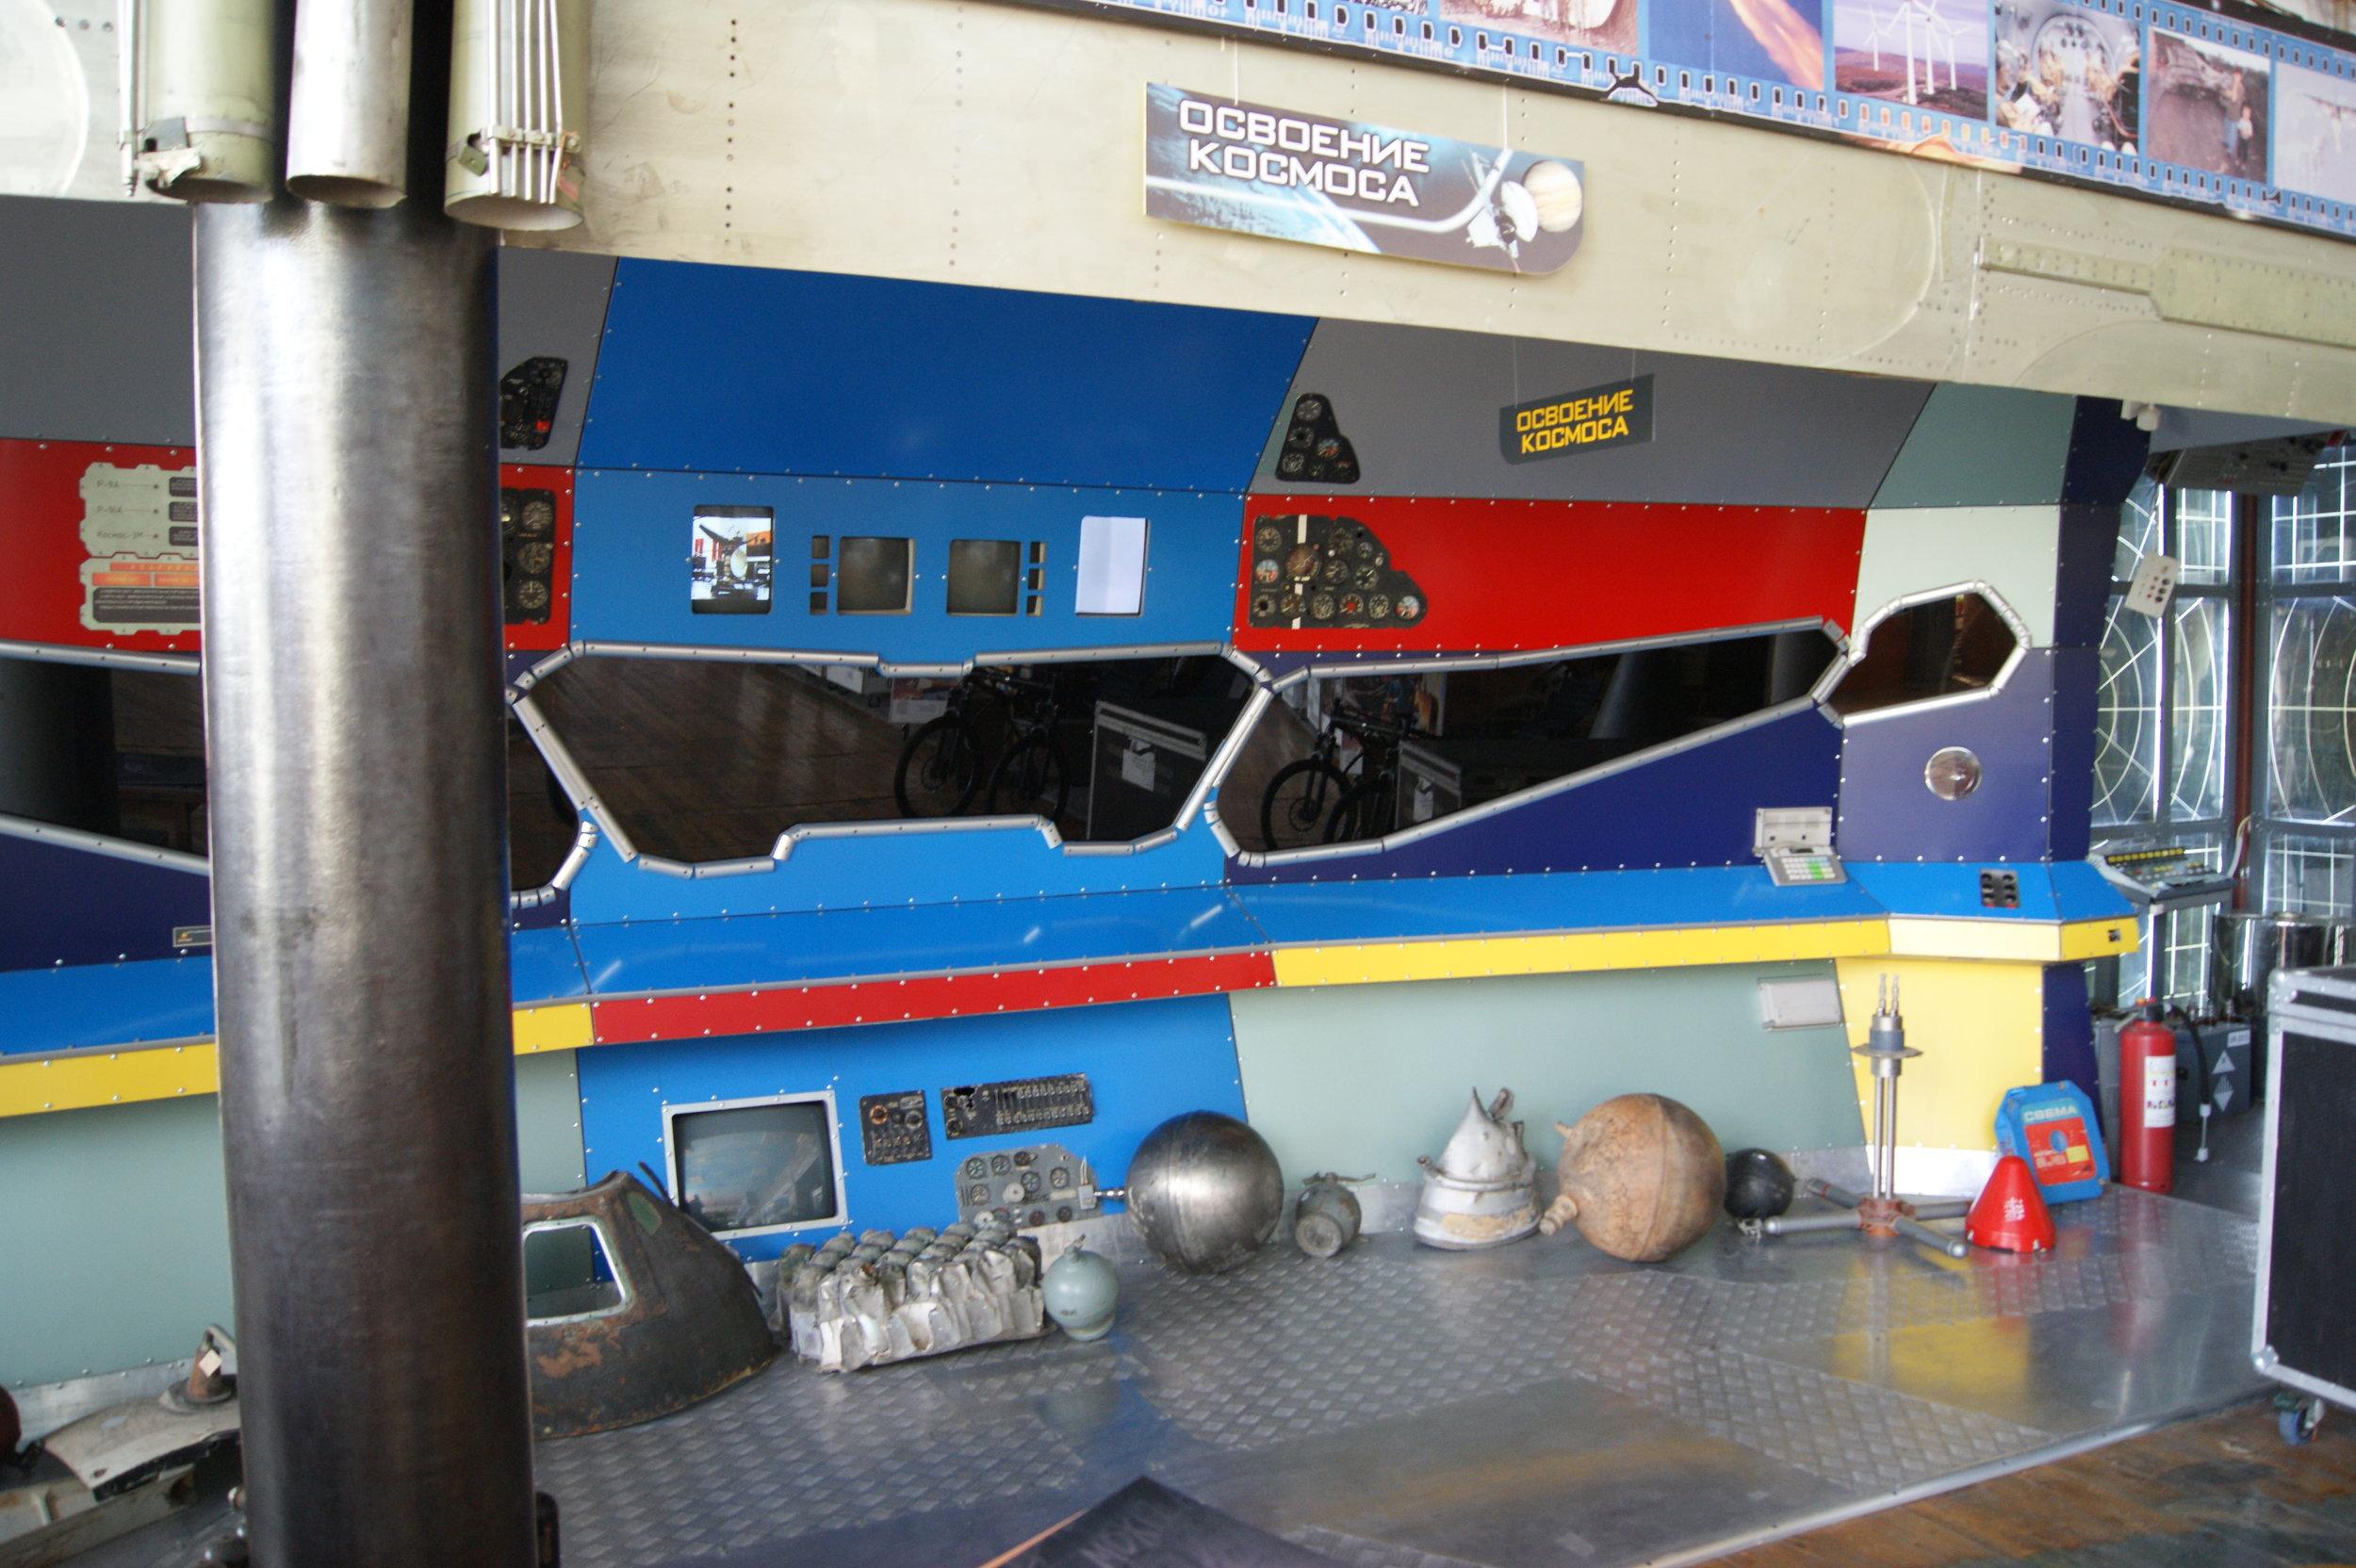 Mir space station mock-up at Karaganda EcoMuseum